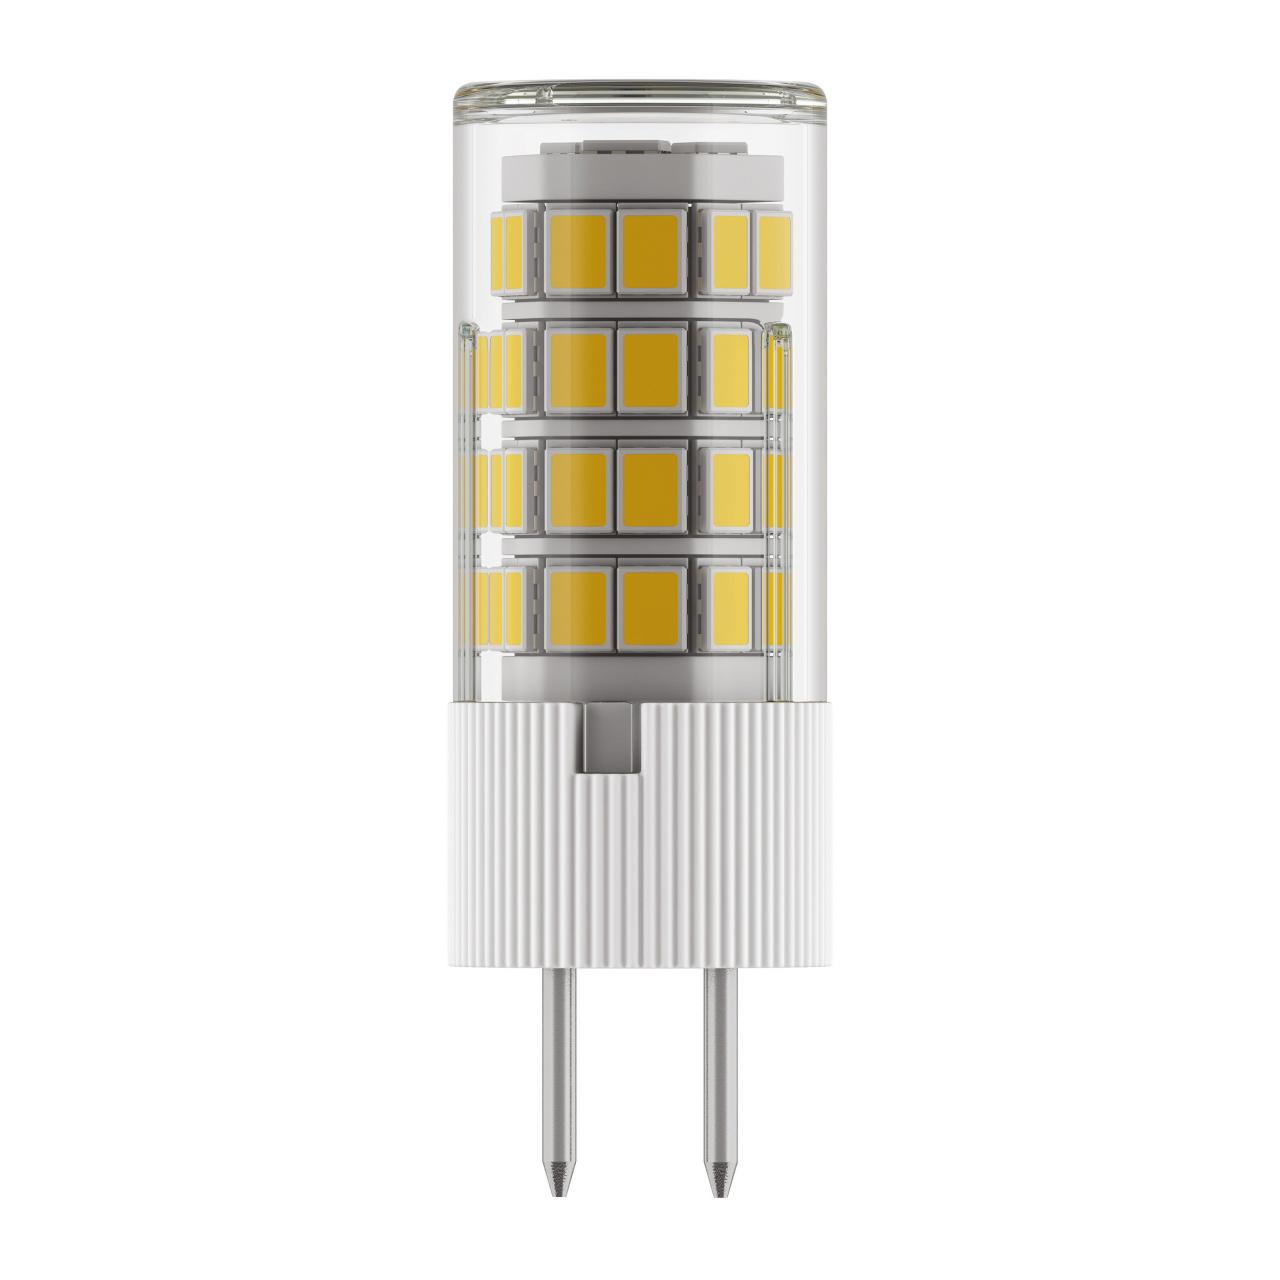 Лампа LED 220V Т20 G4 6W=60W 492LM 360G CL 3000K 20000H Lightstar 940412